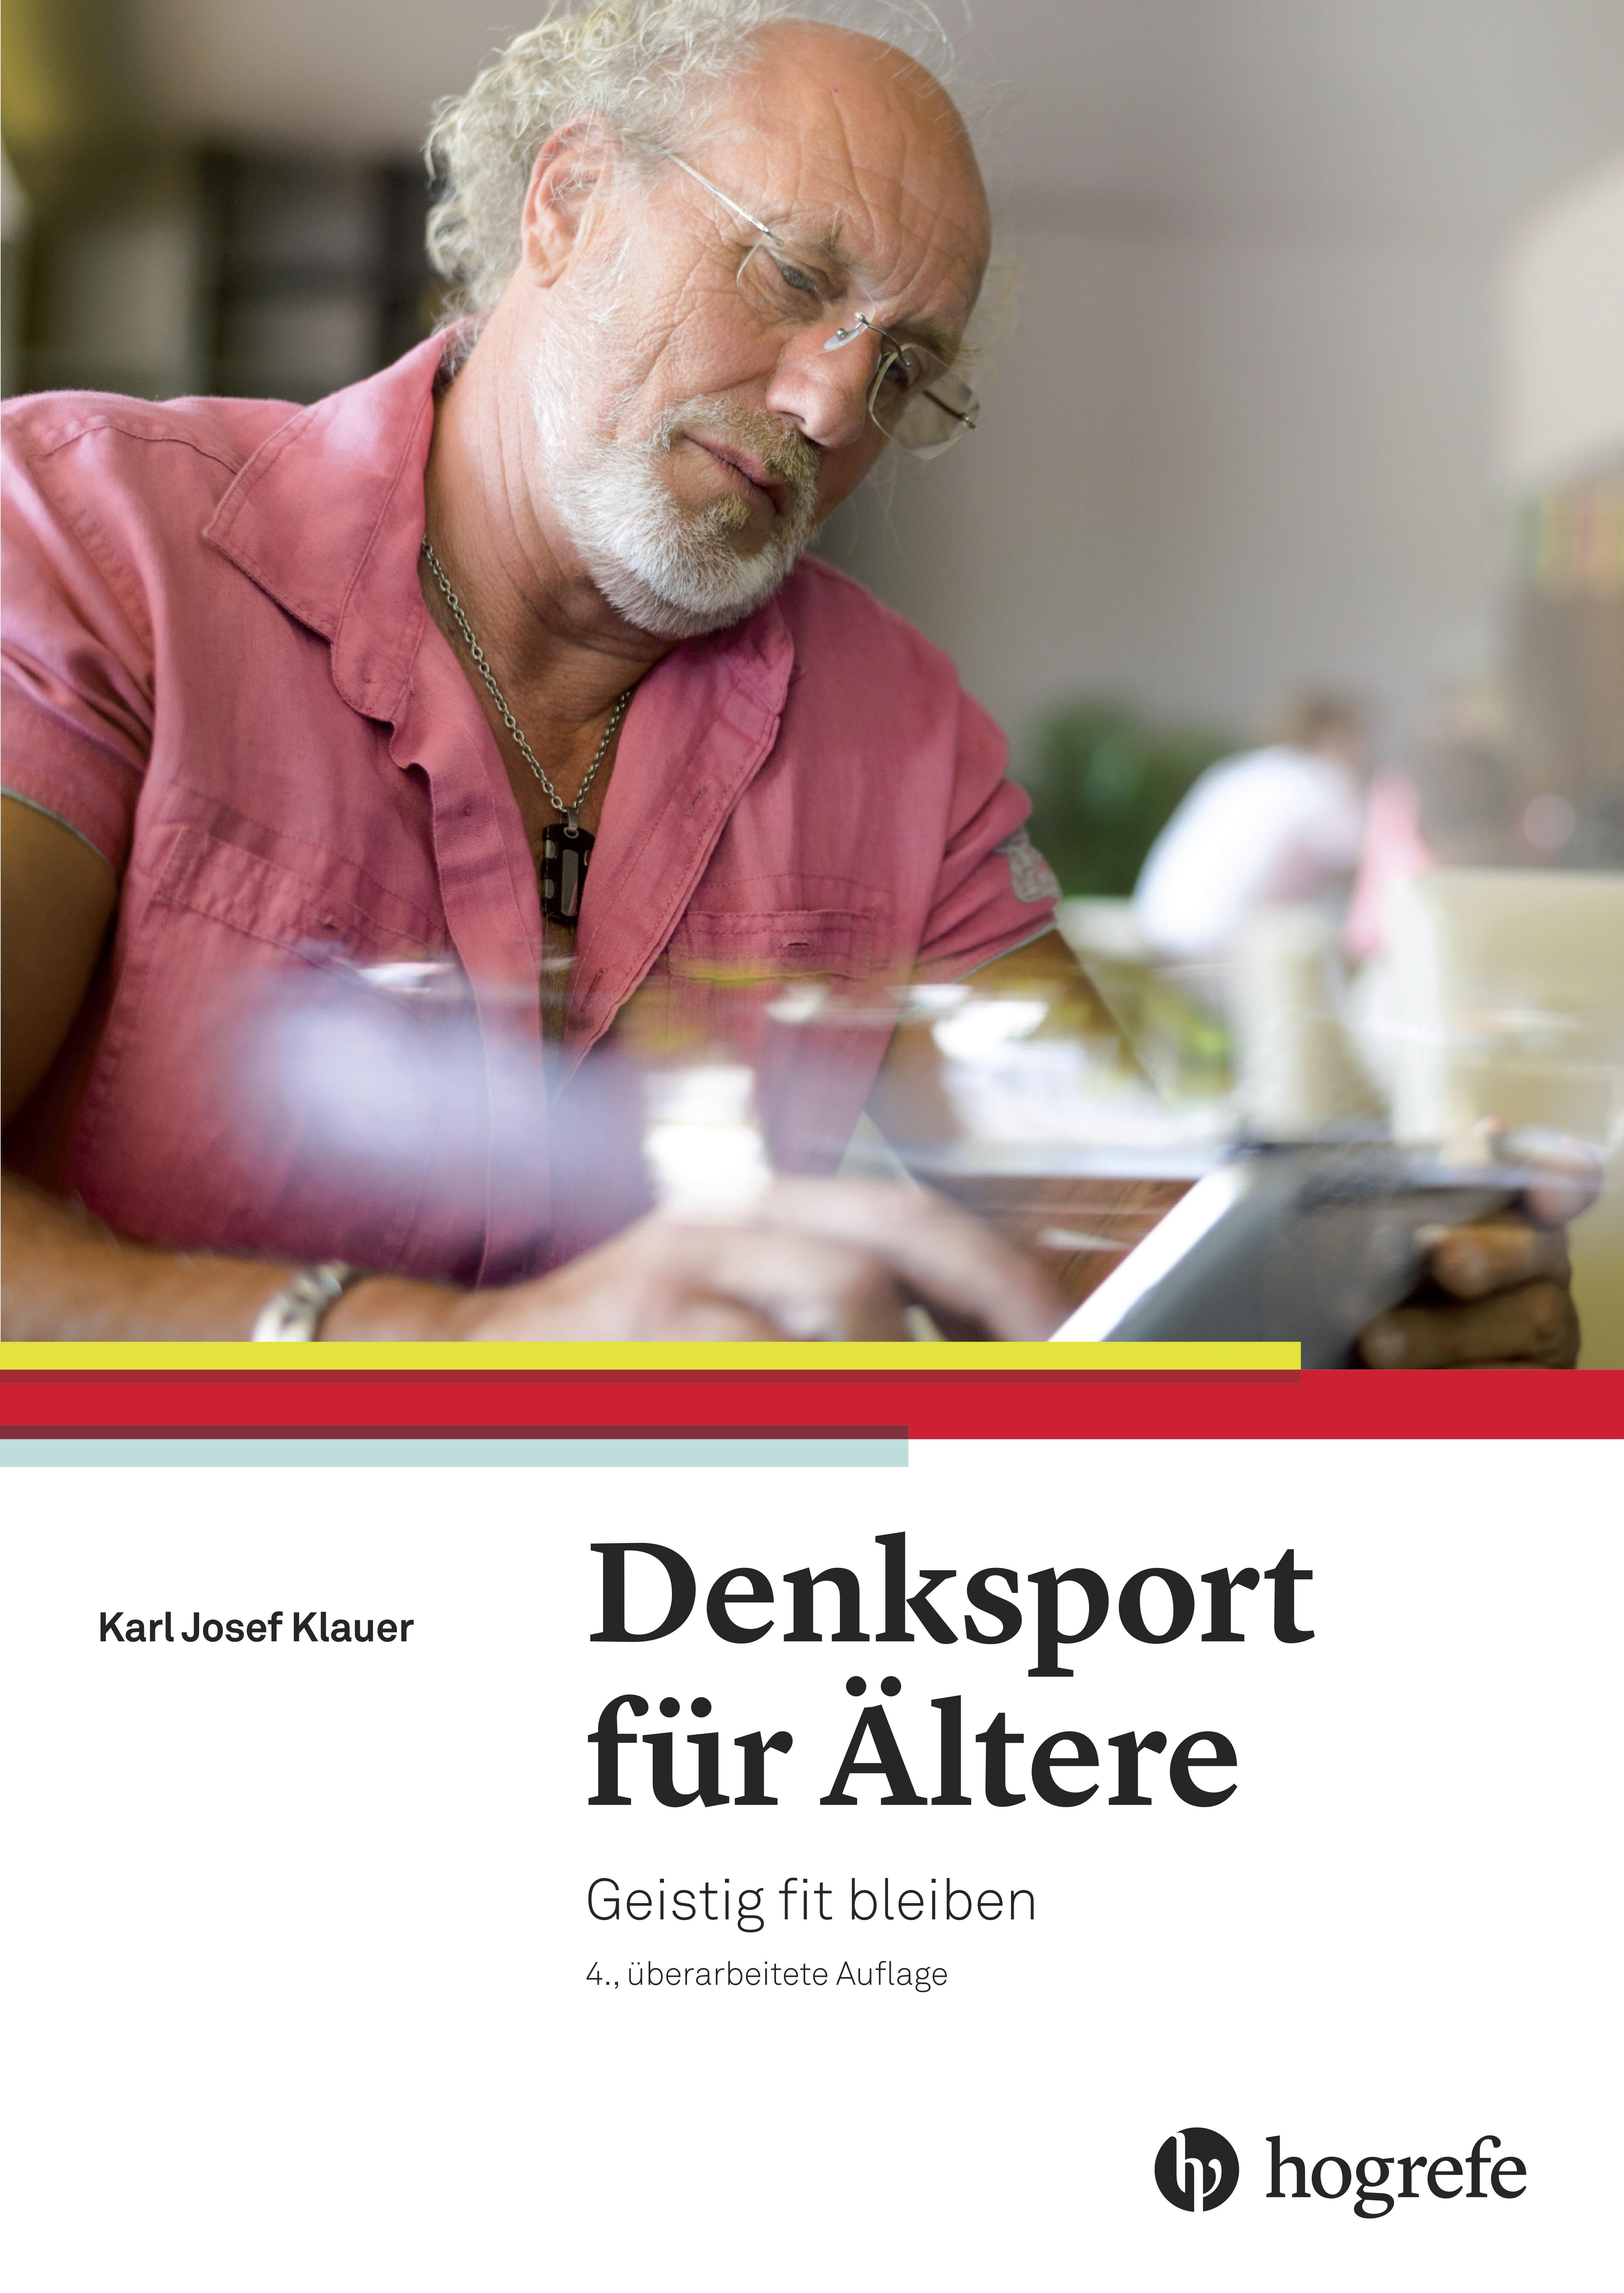 NEU Denksport für Ältere Karl Josef Klauer 855998